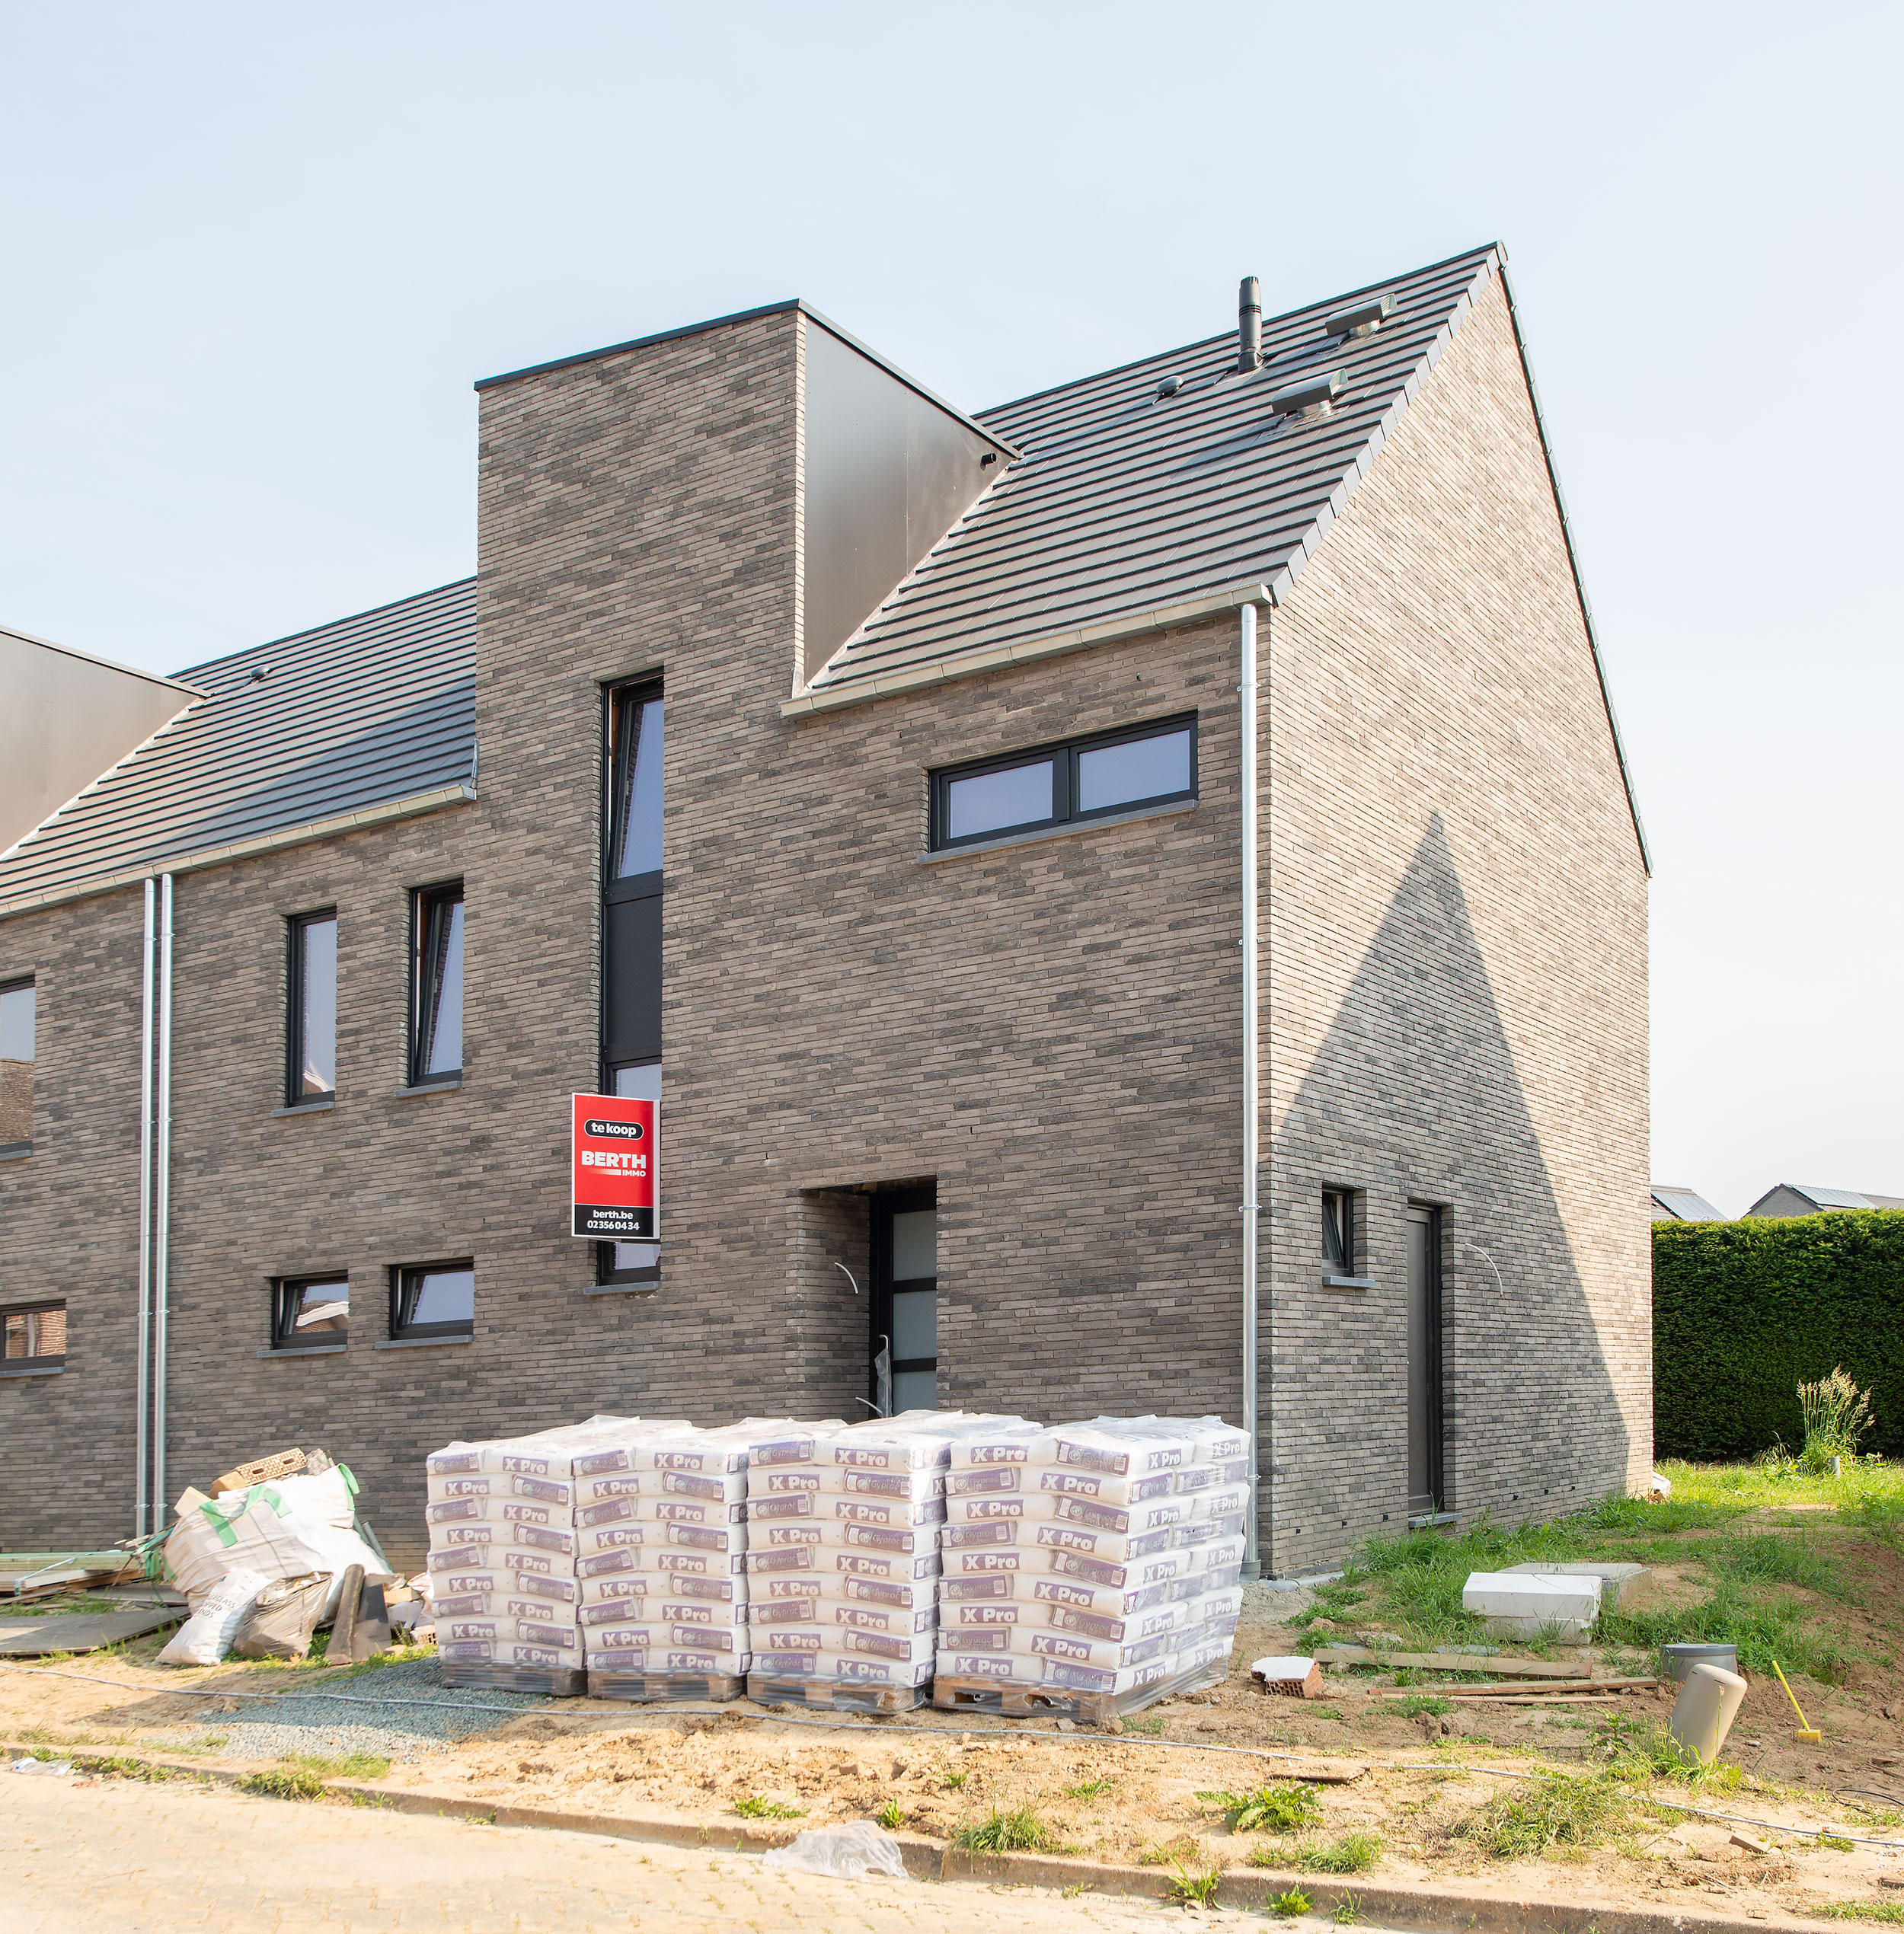 Open Veldstraat, 9473 Welle